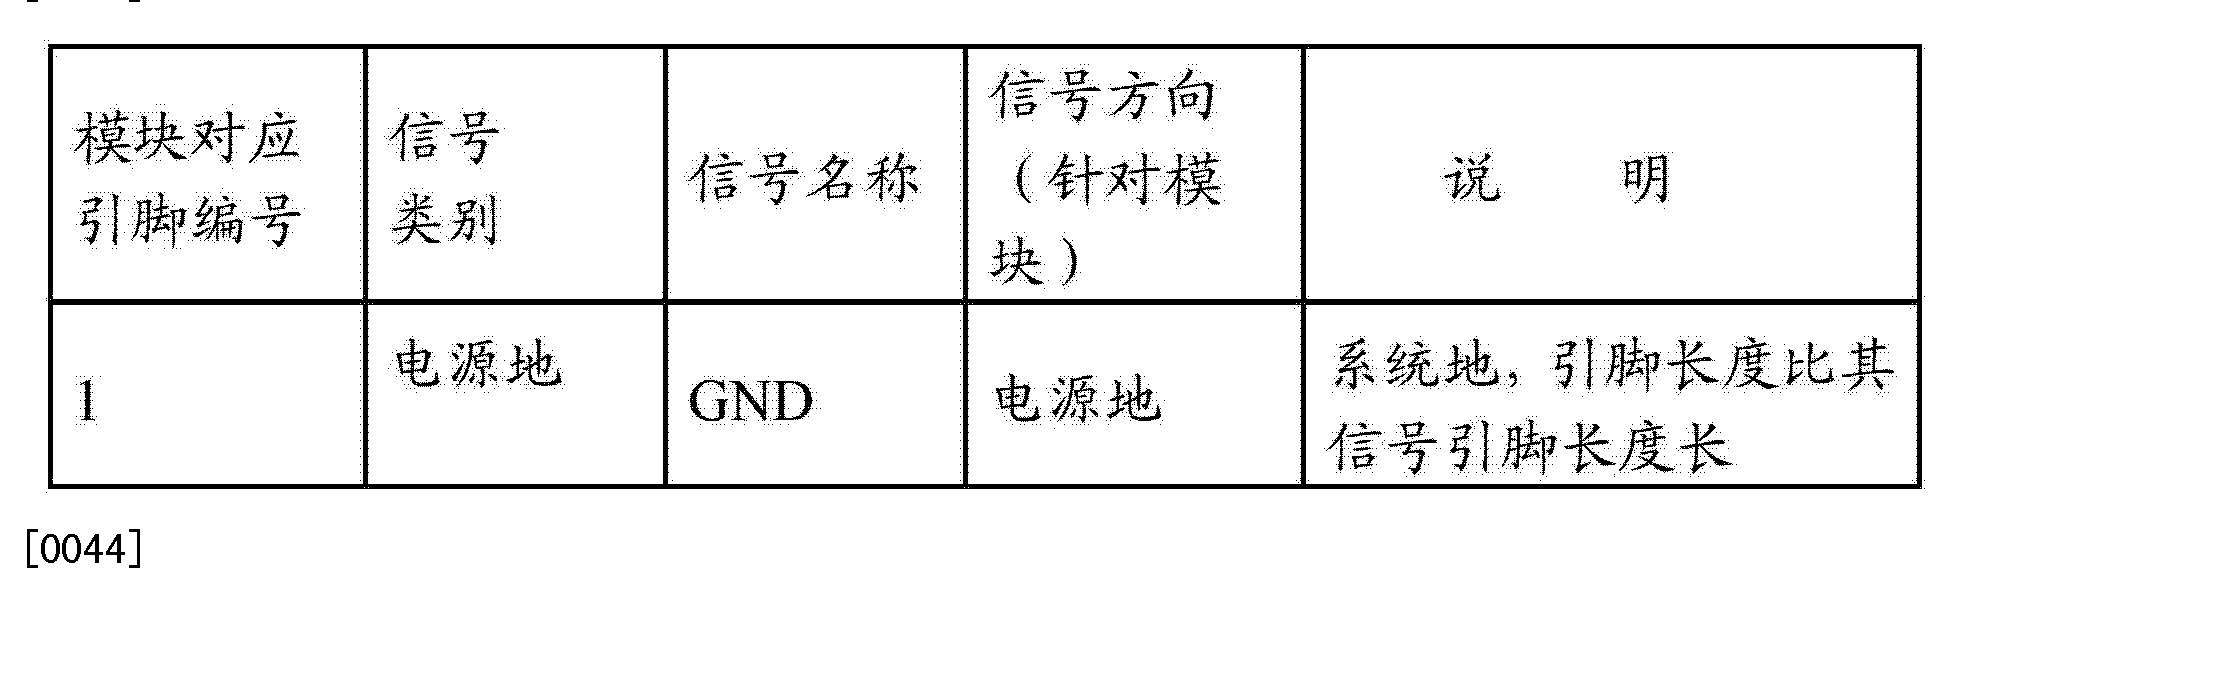 Figure CN103280091AD00061